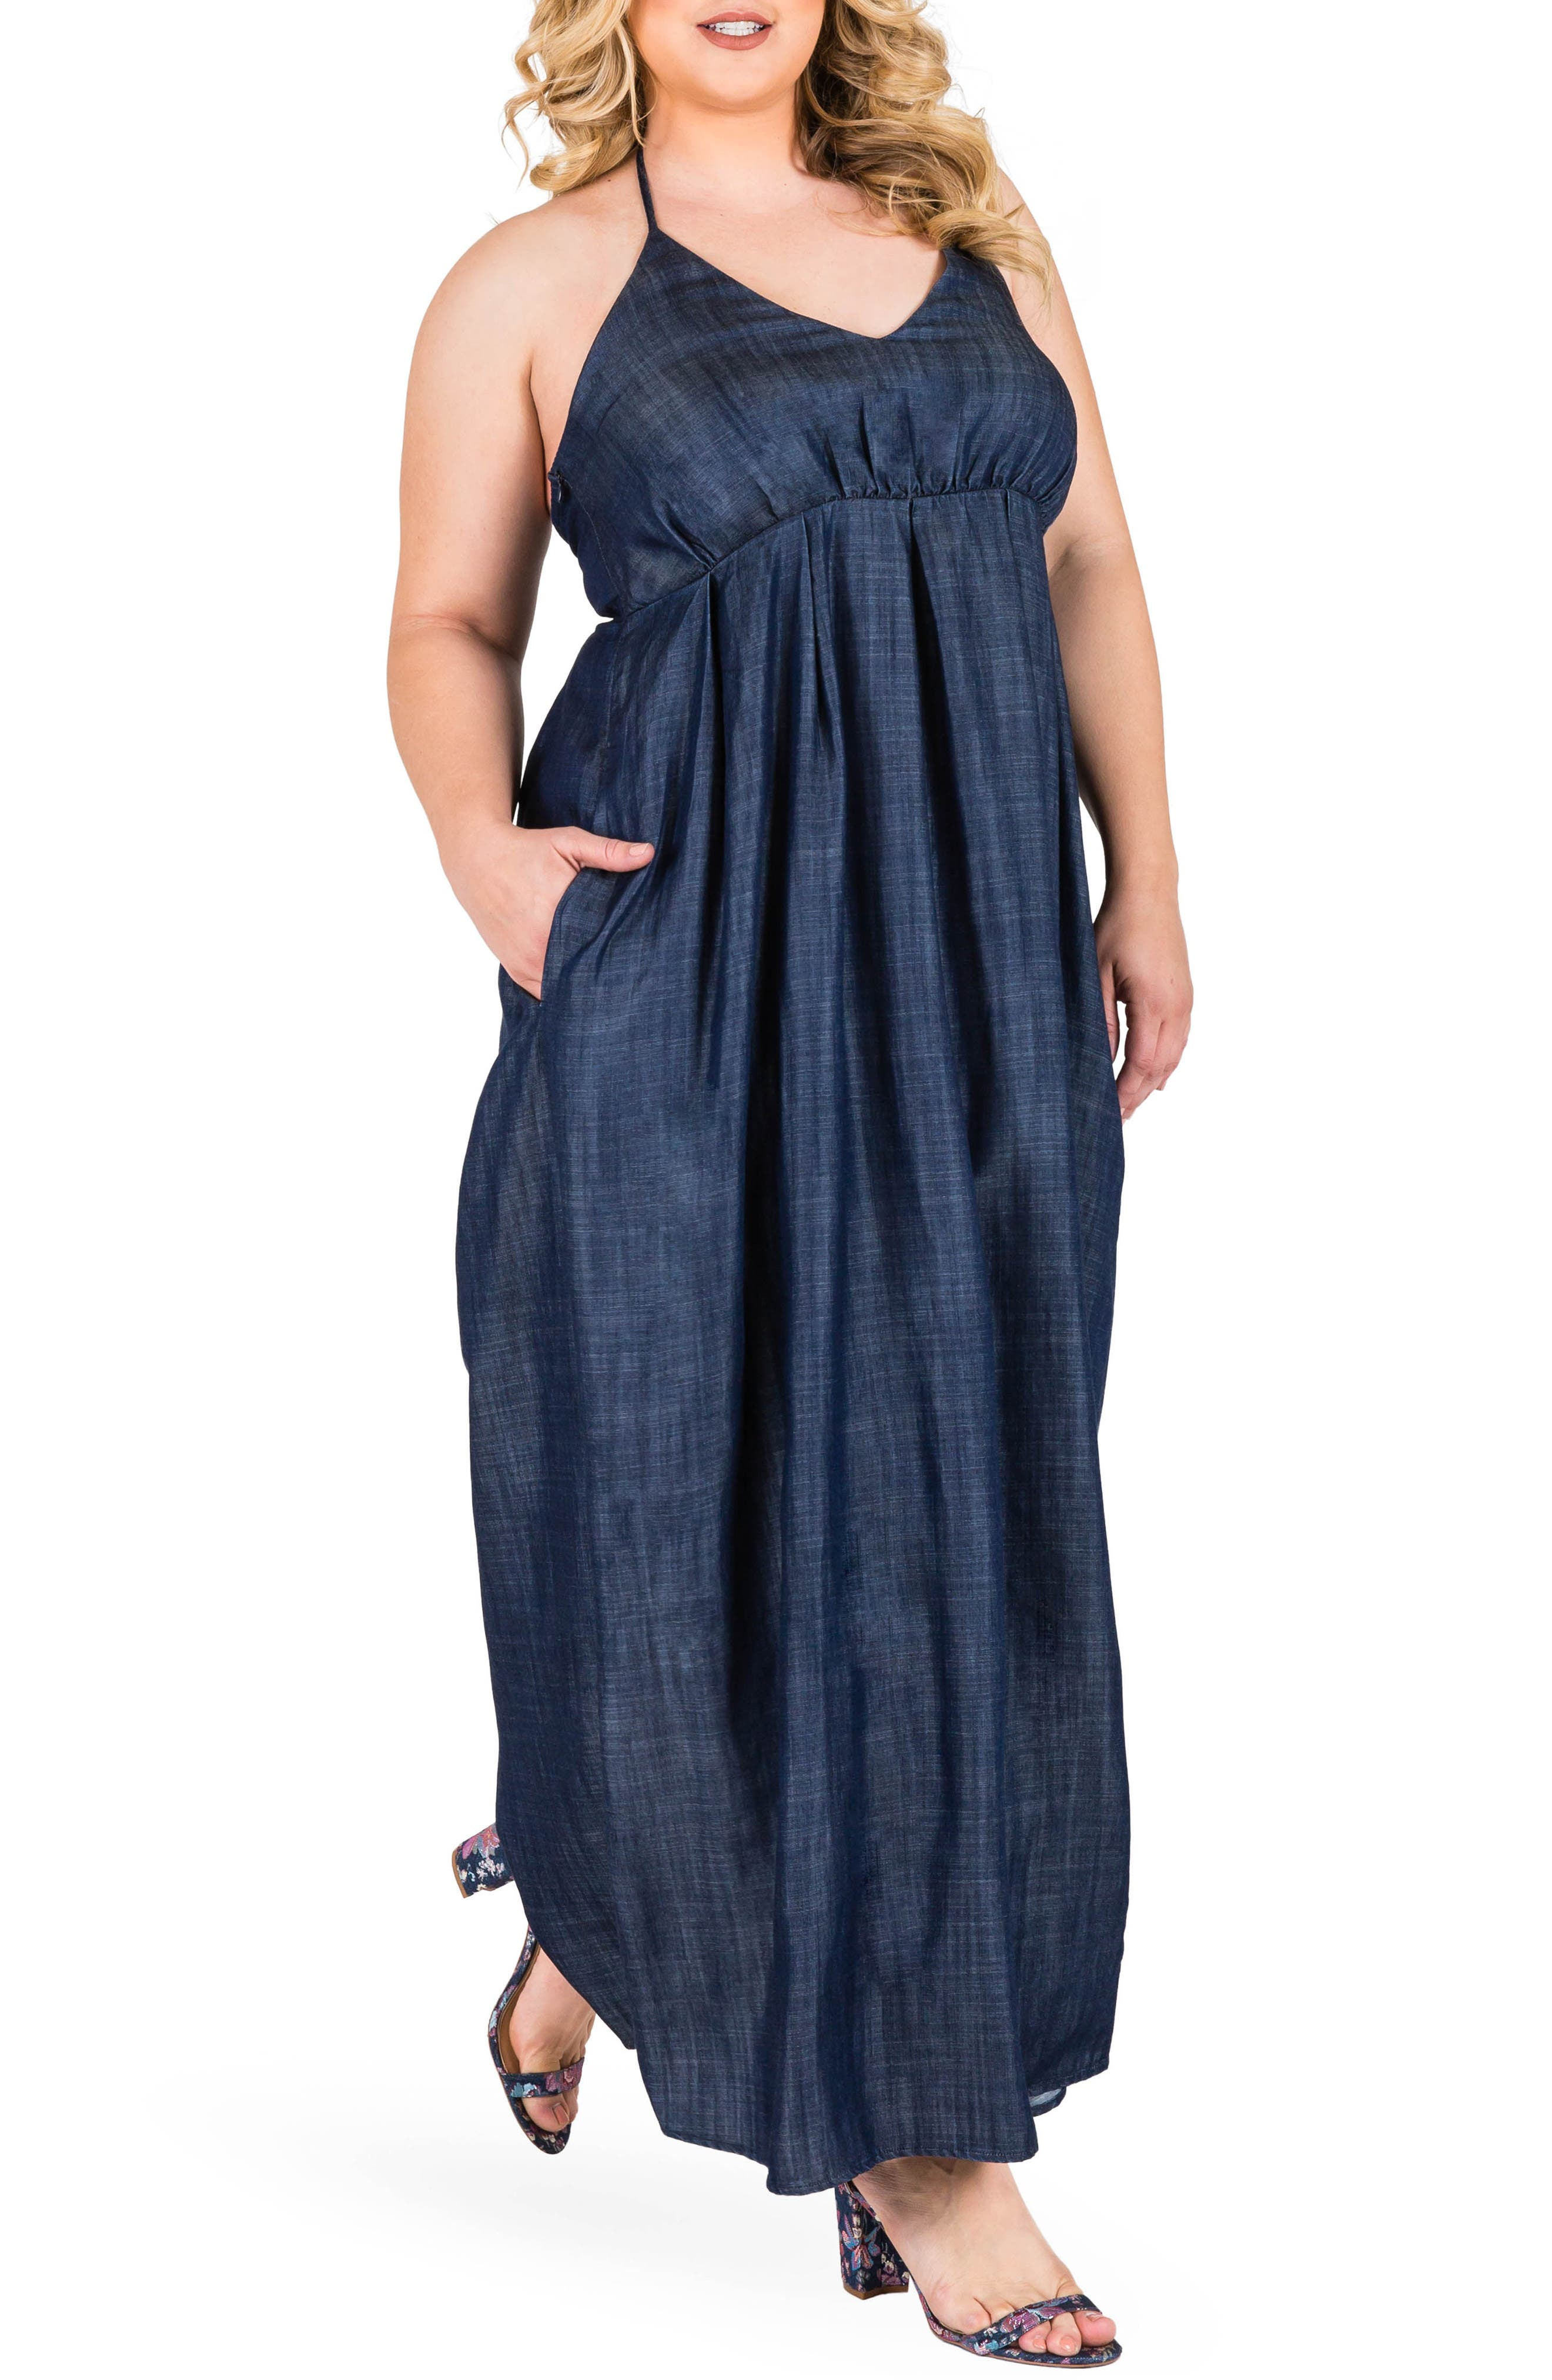 Maui Maxi Chambray Halter Dress,                         Main,                         color, DARK BLUE